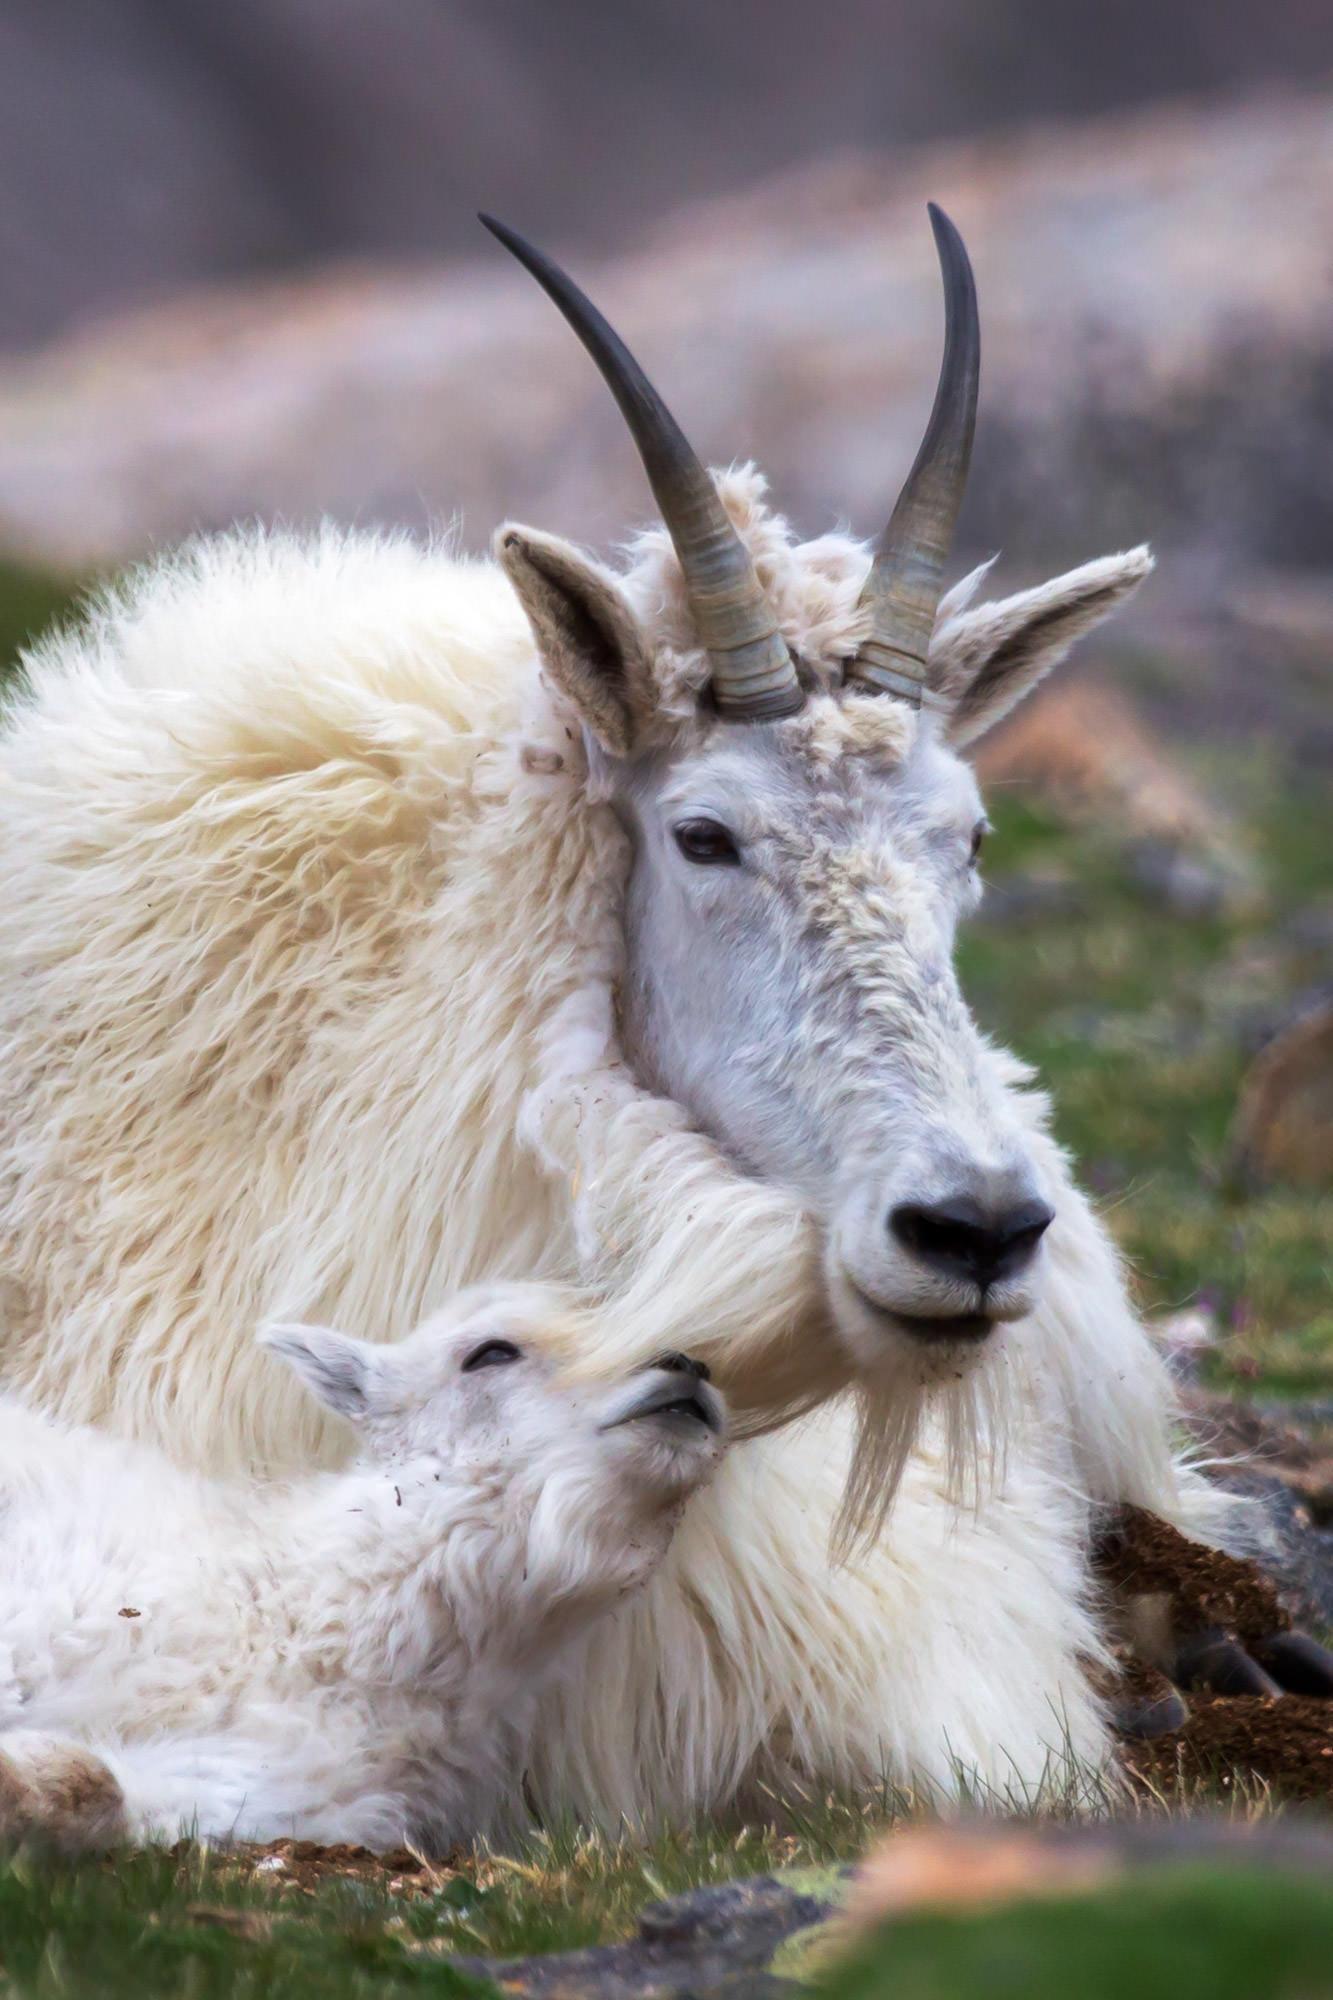 Goat, Mountain Goat, Colorado, Mount Evans, limited edition, photograph, fine art, wildlife, photo